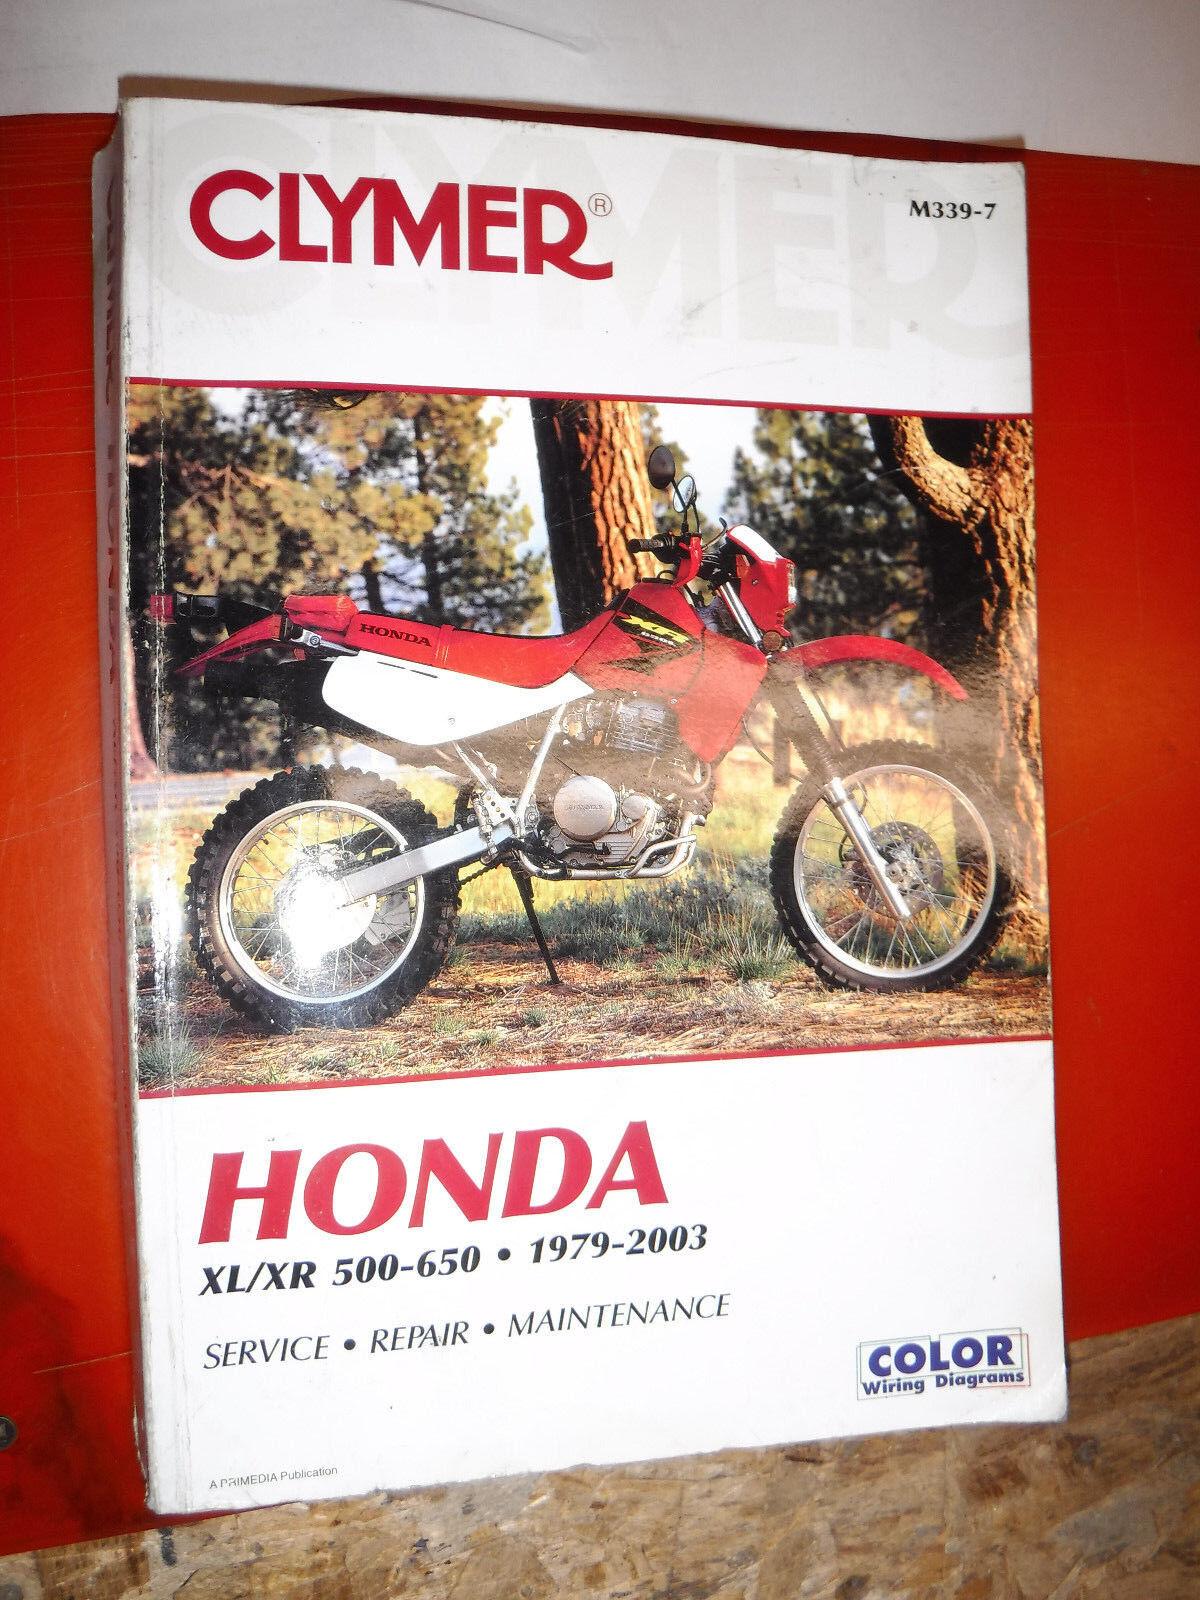 Clymer Honda 1979 2003 Xl Xr 500 650 Service Repair Maintenance Triumph Wiring Diagram On Bsa Positive Ground Manual Ebay